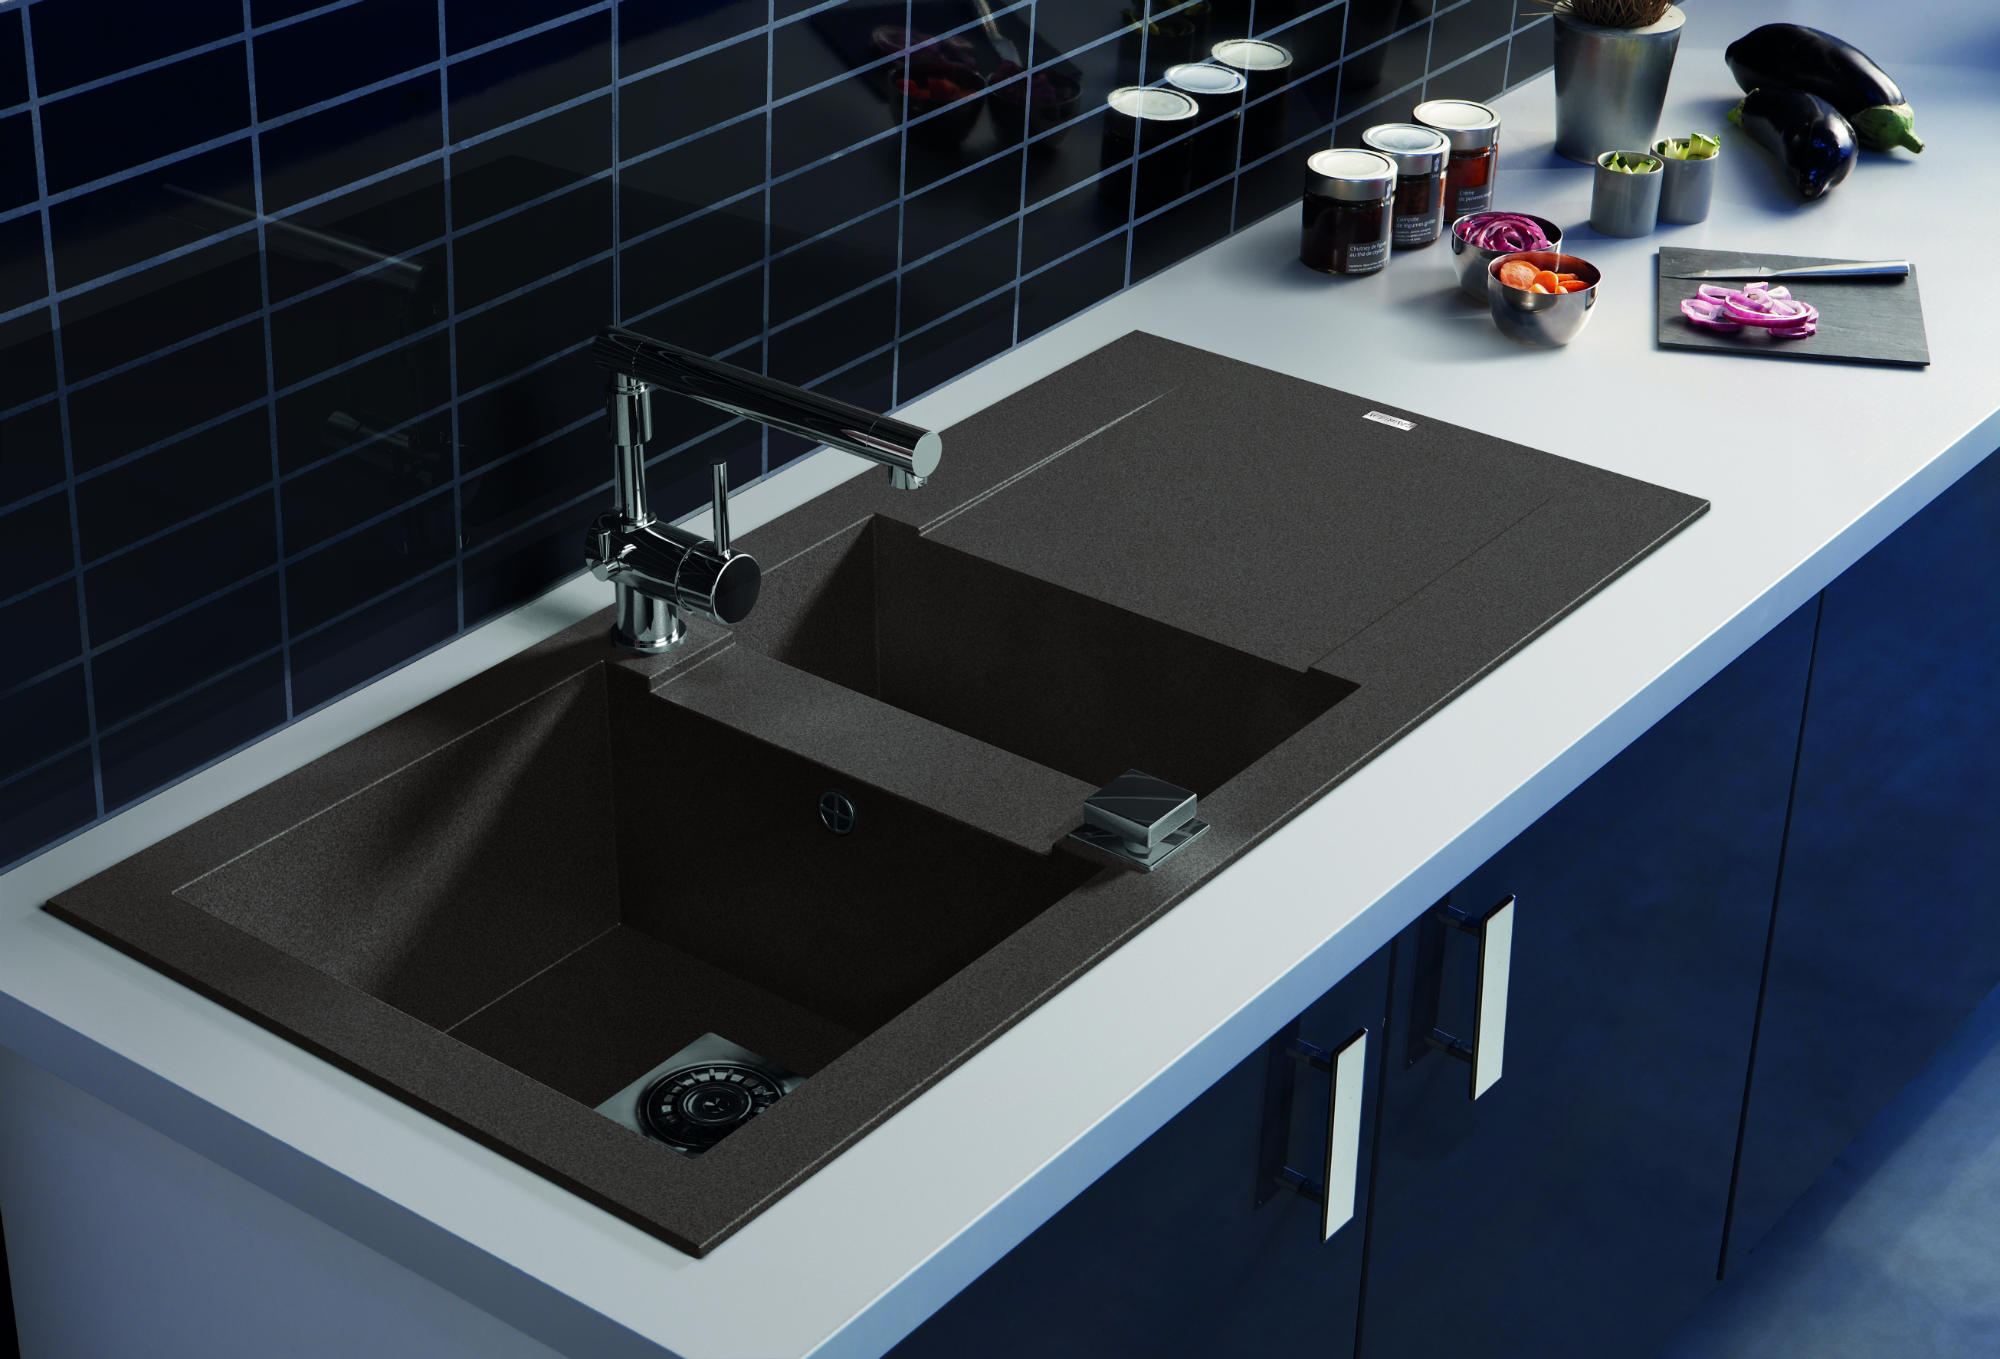 carea sanitaire platy carea sanitaire. Black Bedroom Furniture Sets. Home Design Ideas